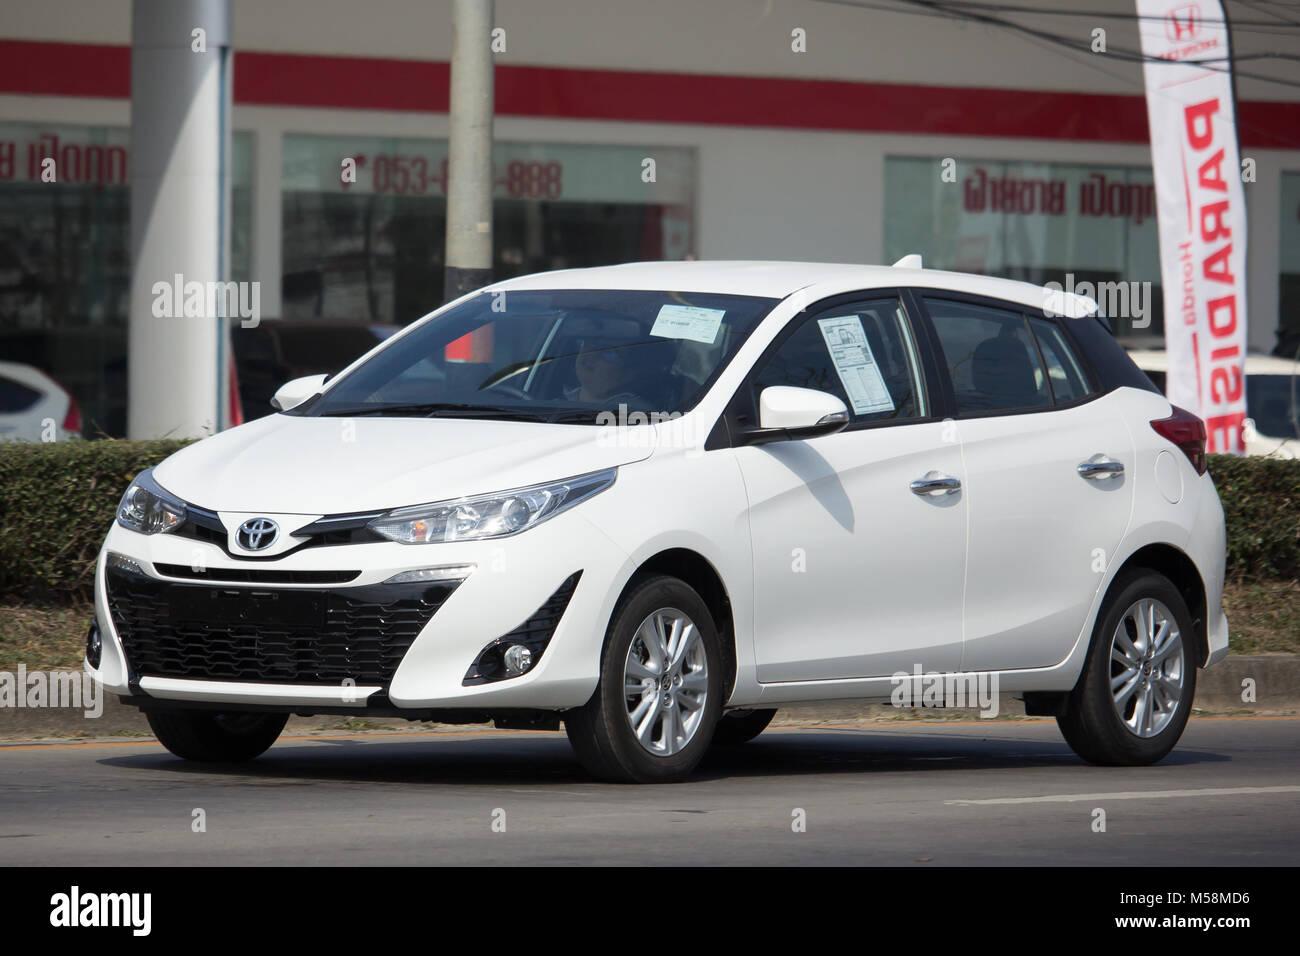 Chiang Mai Thailand January 19 2018 New Private Car Toyota Yaris